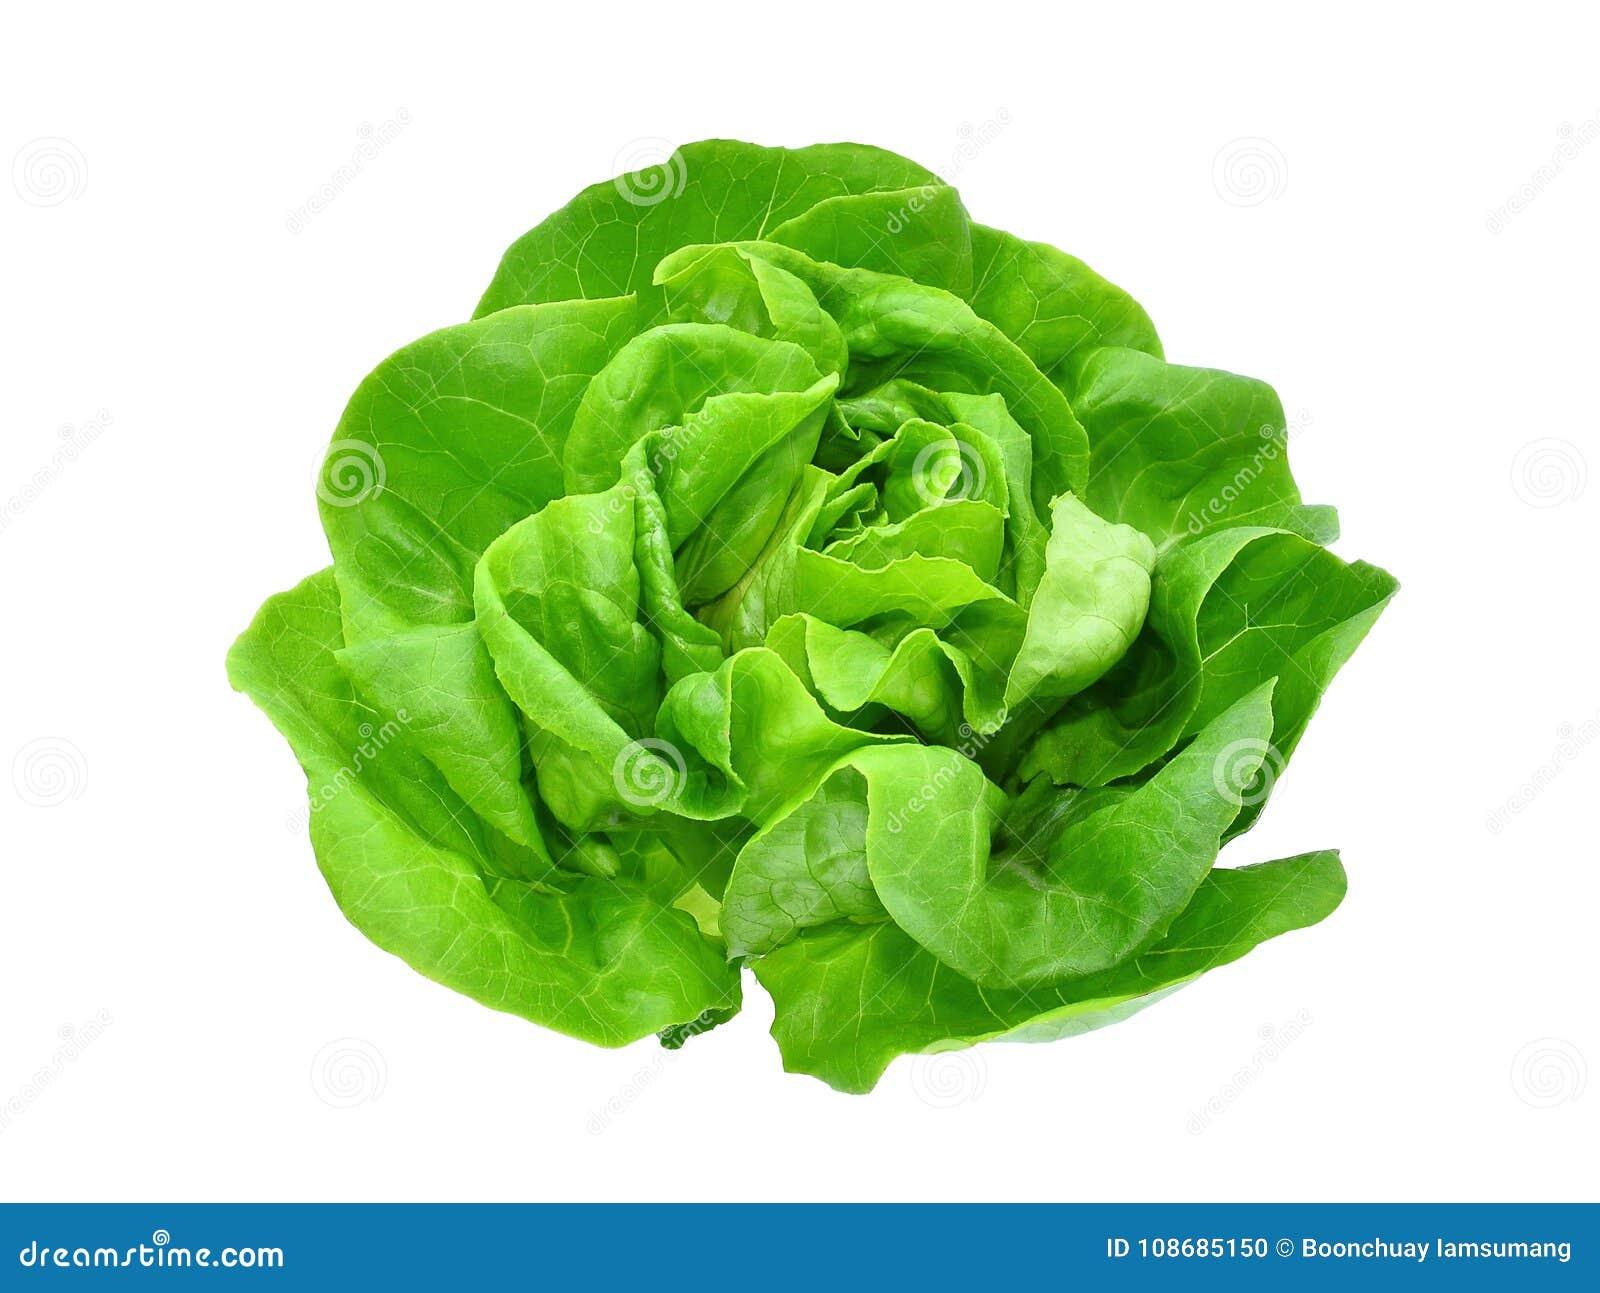 Green butter lettuce vegetable or salad isolated on white